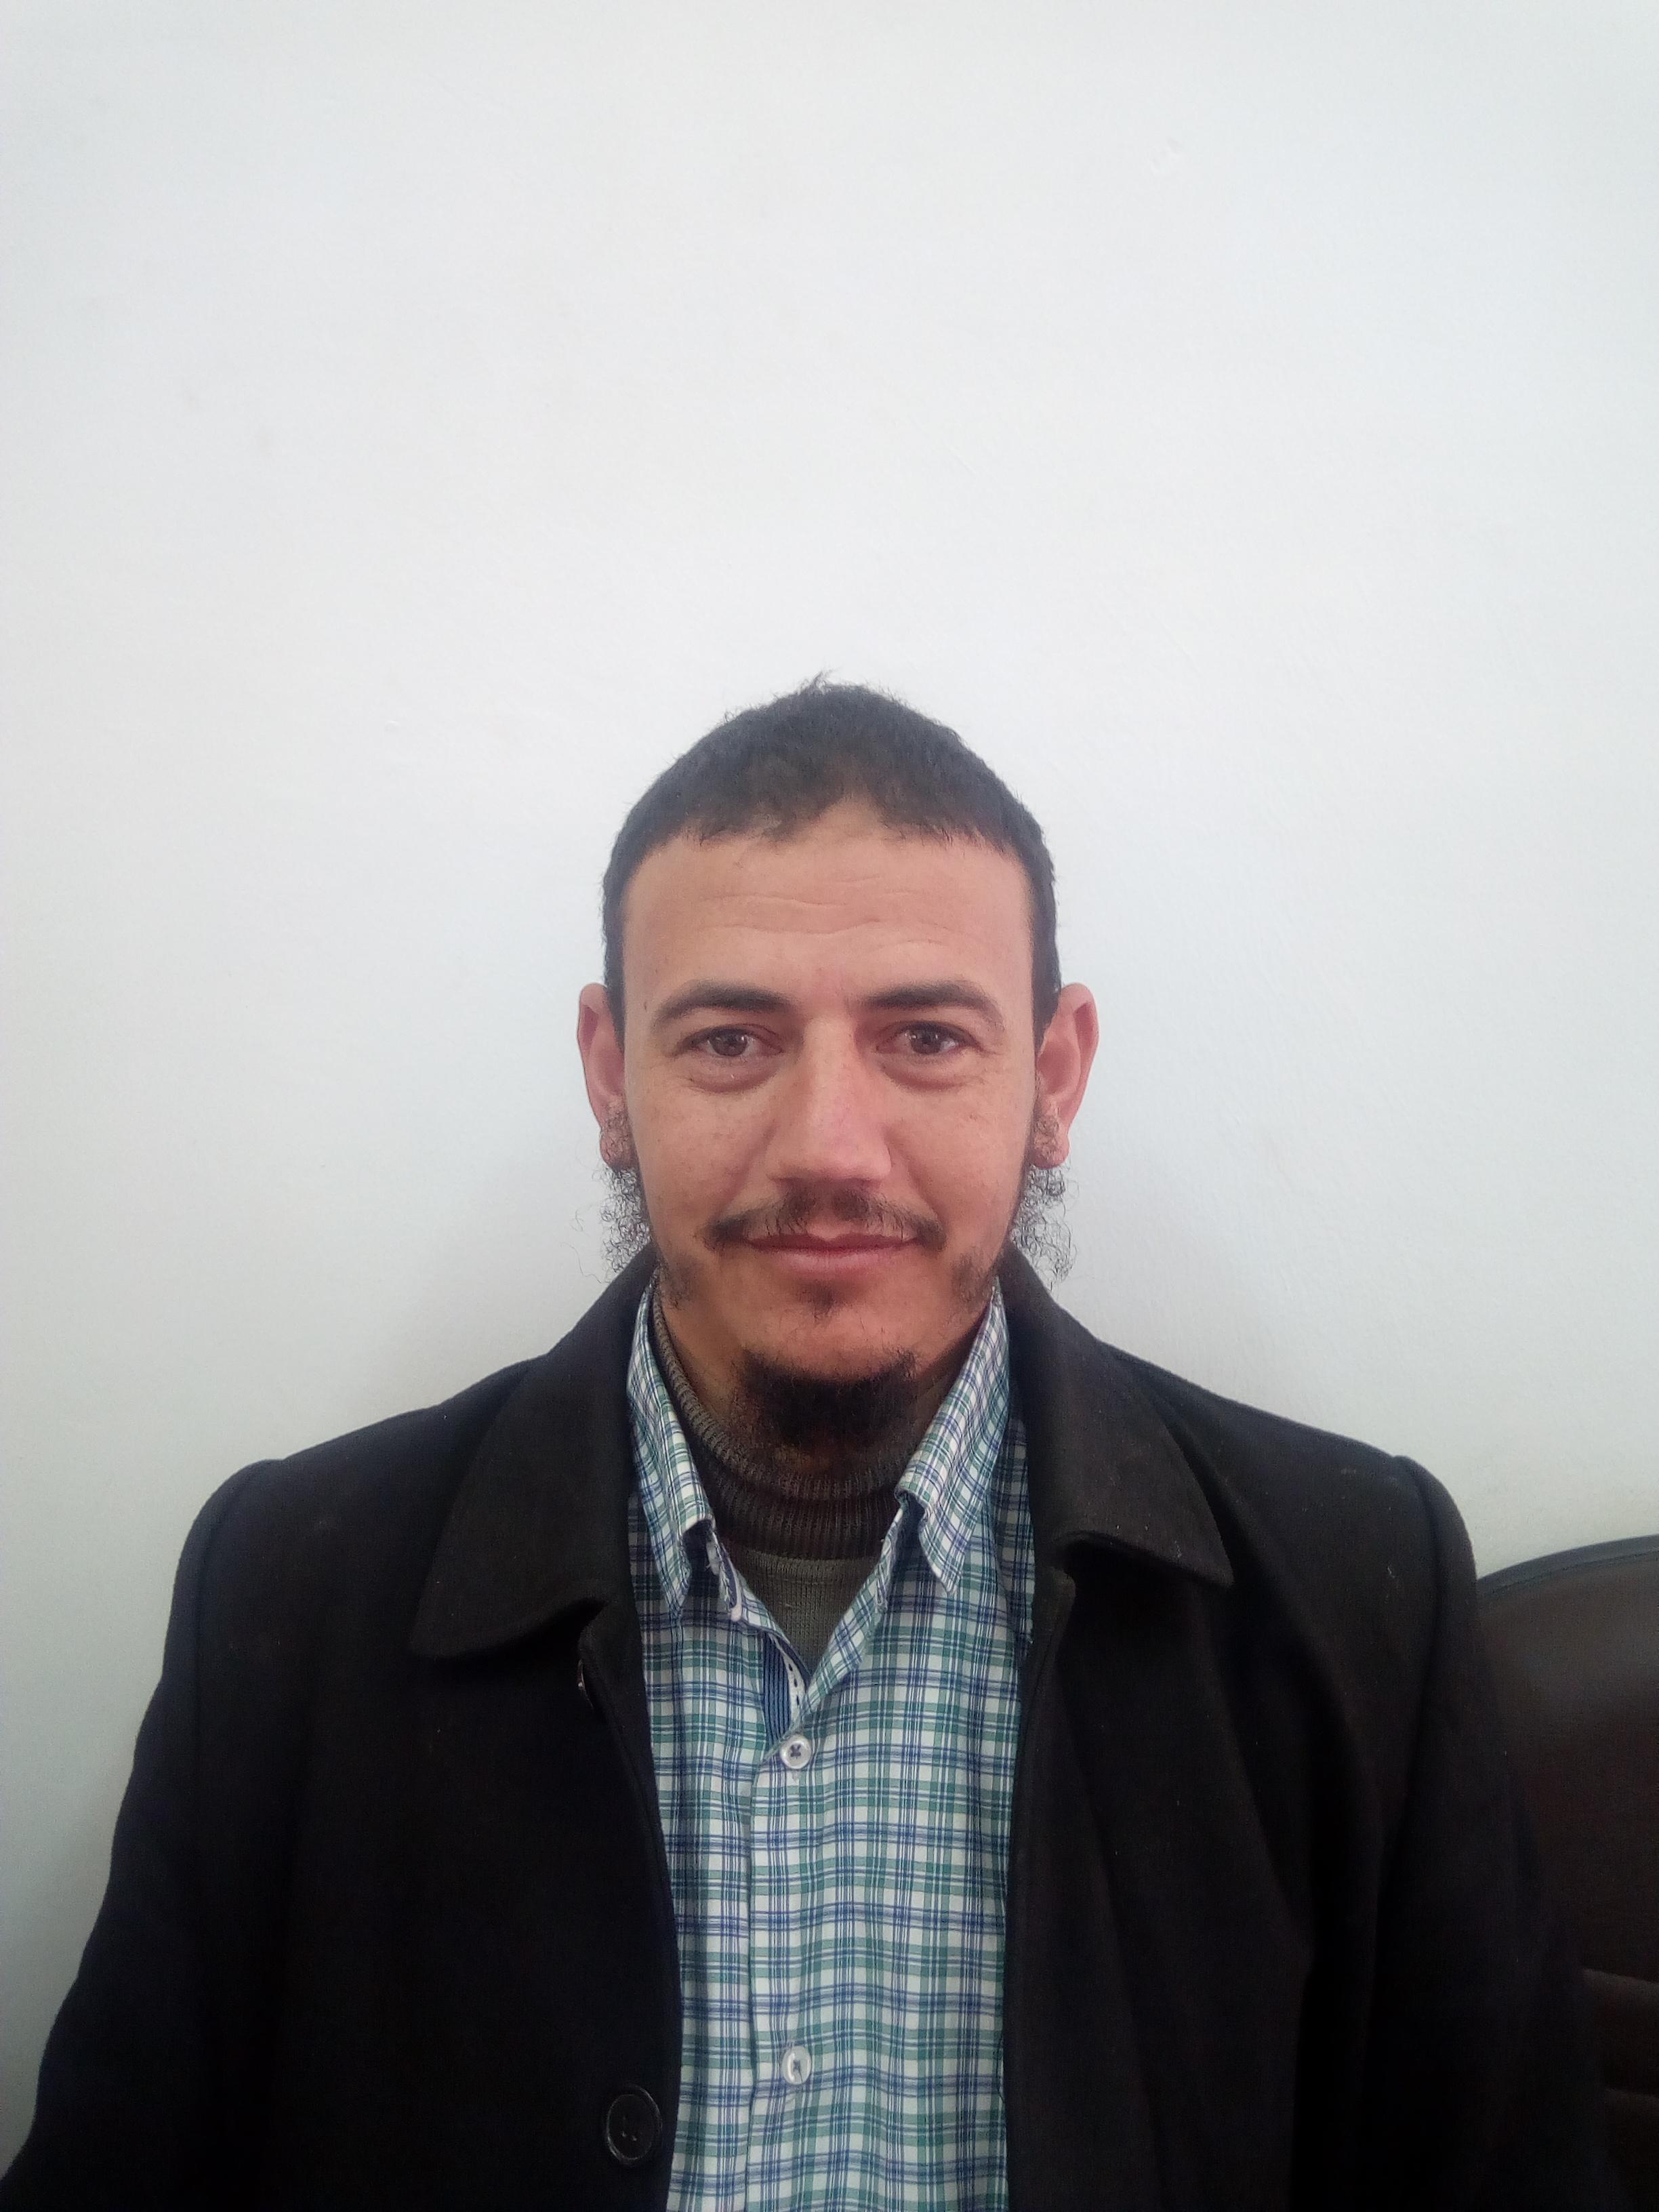 Aliheda Profile Picture